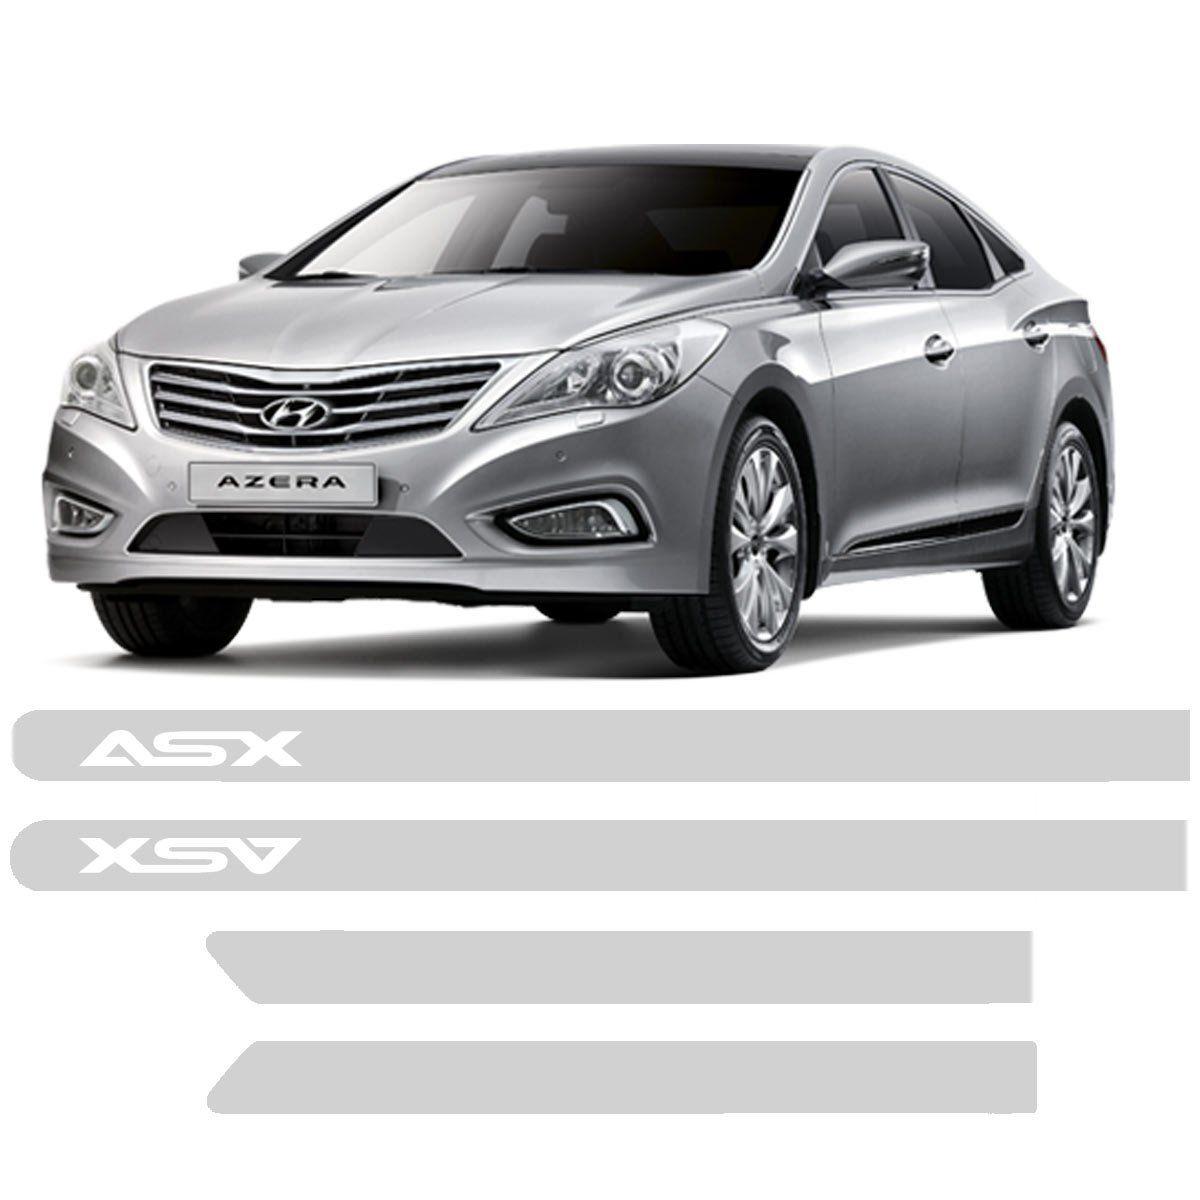 Friso Lateral Azera Hyundai Personalizado